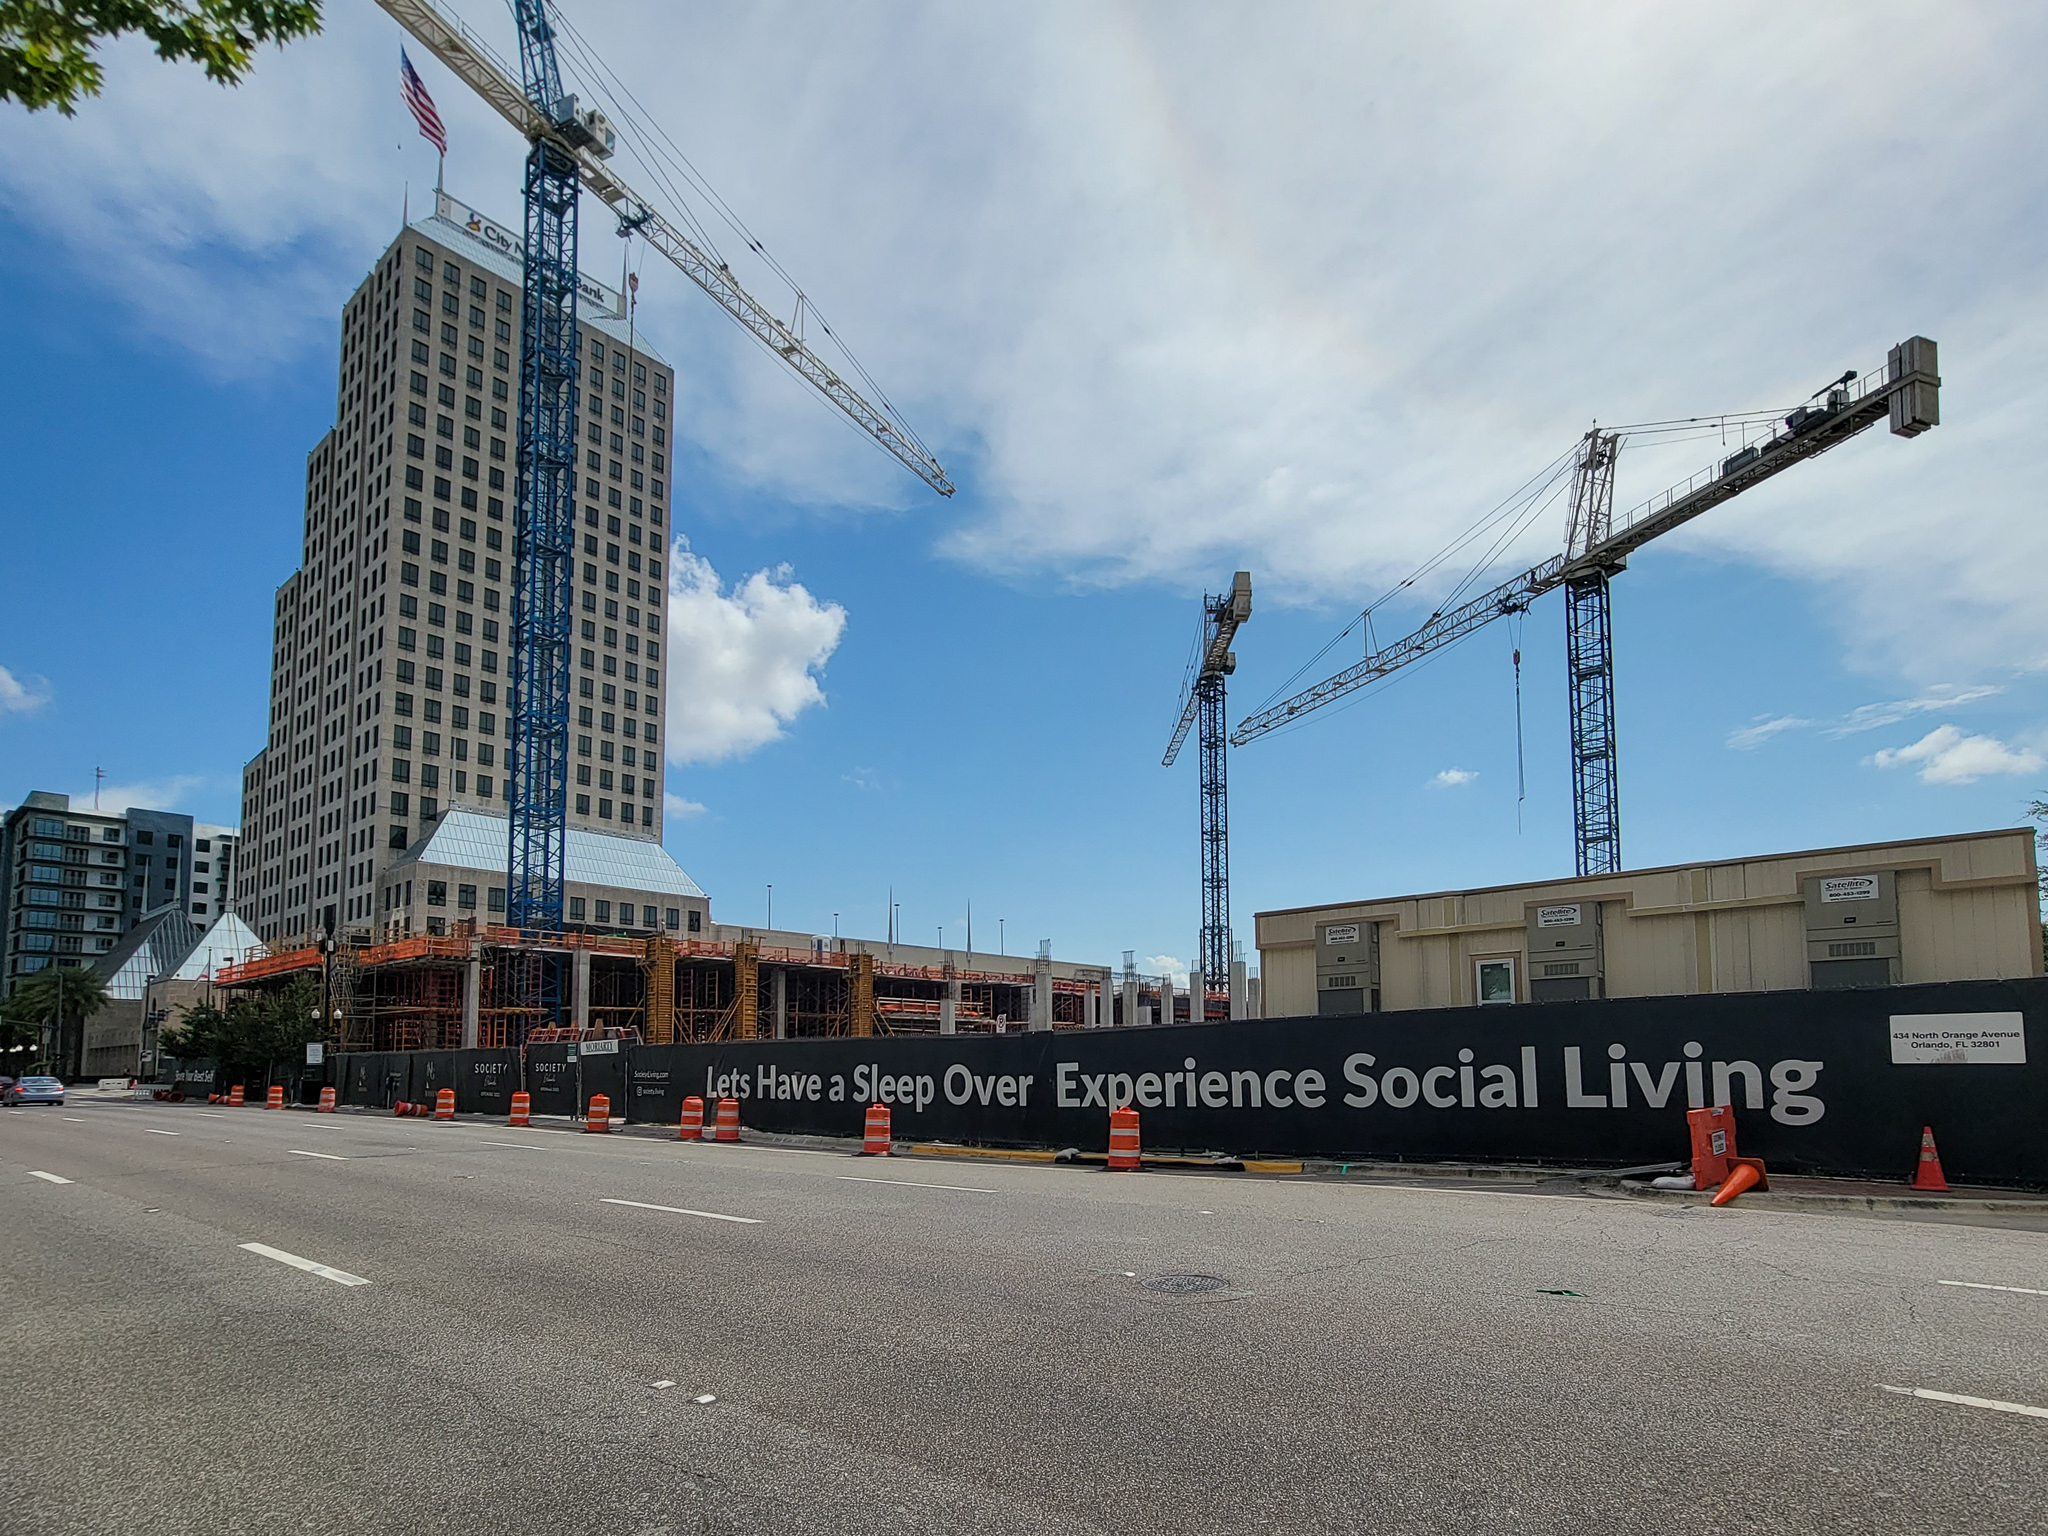 Society Orlando. Photo by Oscar Nunez.